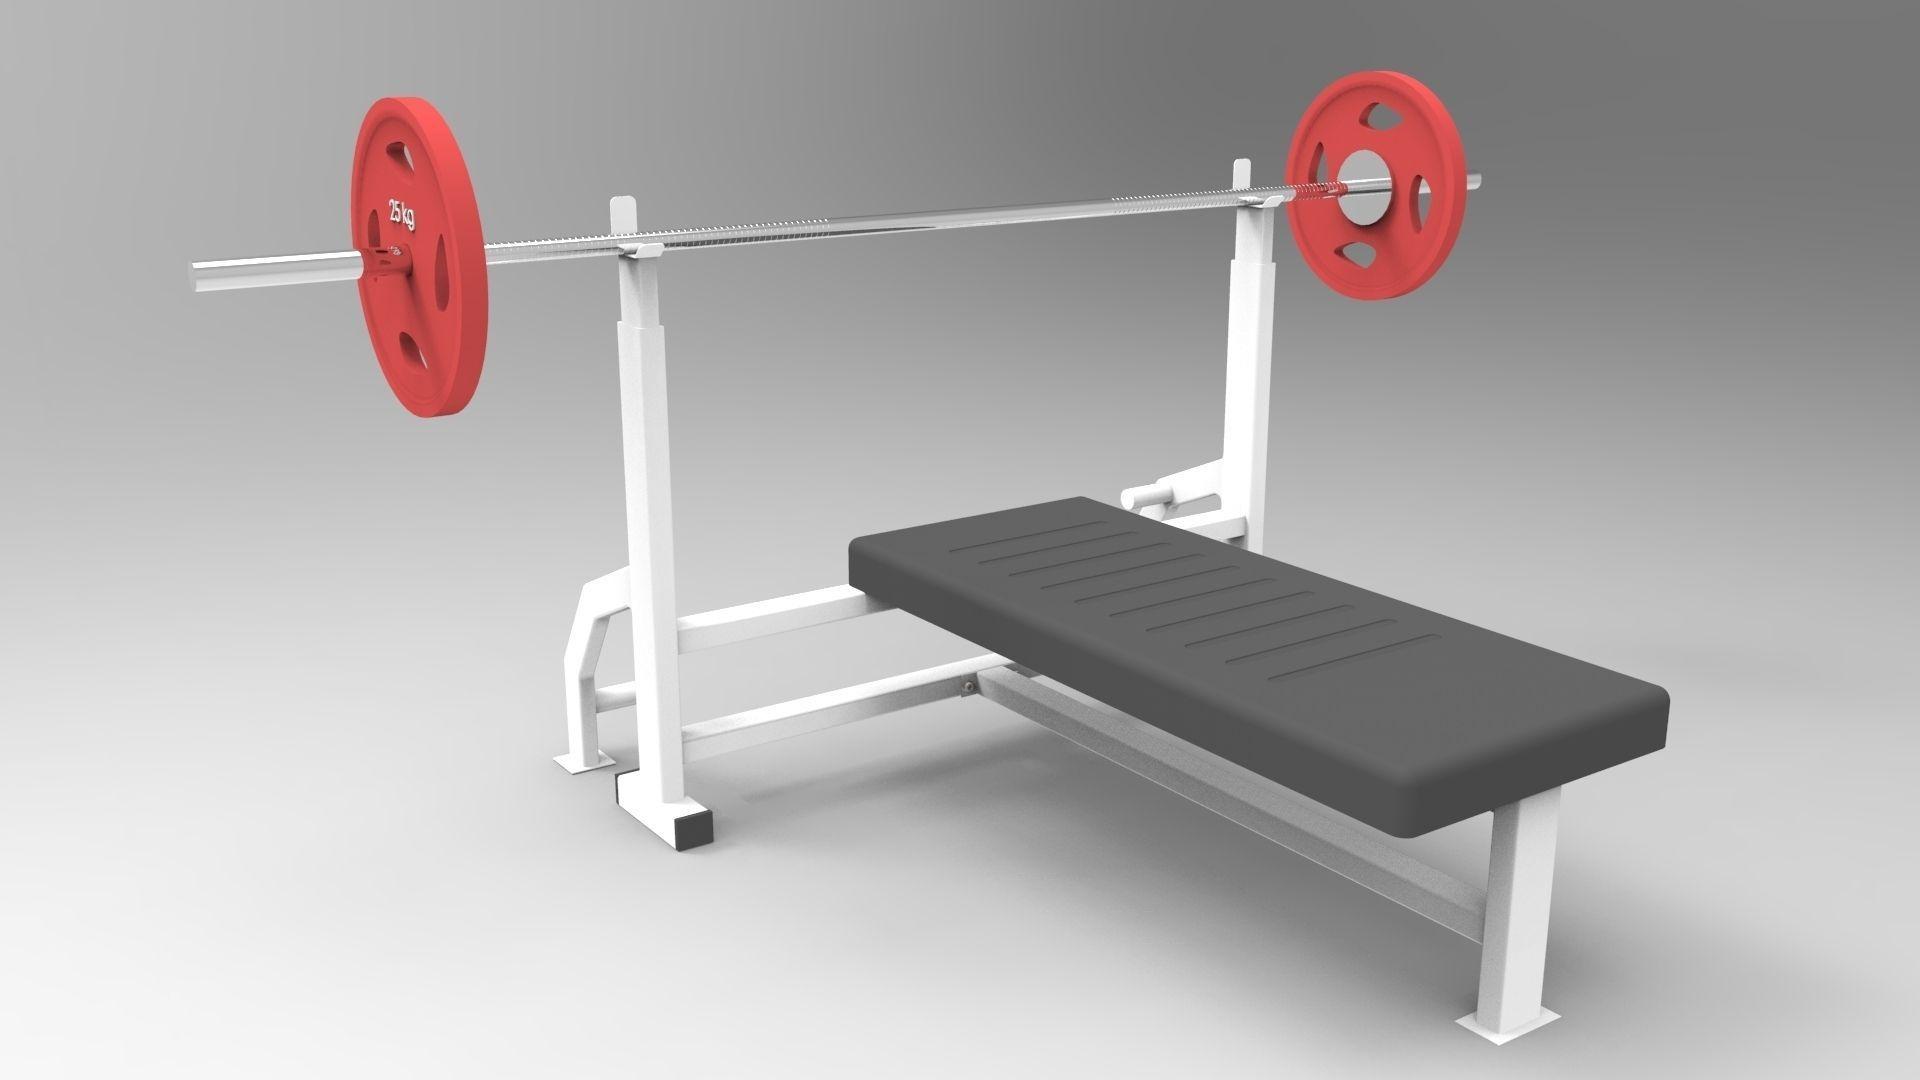 gym chest chair teacher rocking press bench barbell 3d model sldprt sldasm